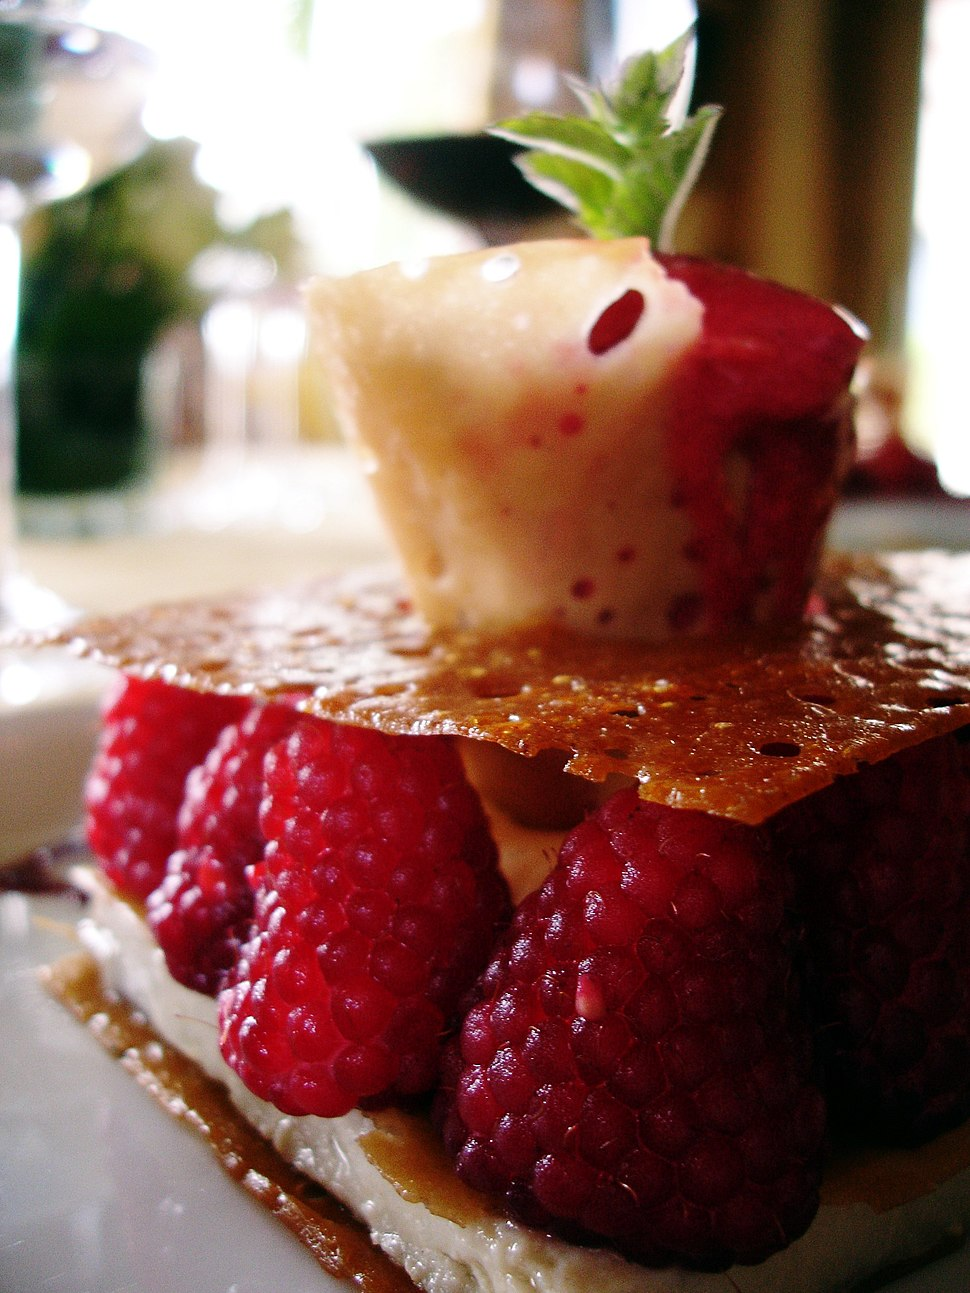 Jasmine green tea crème brûlée with raspberries